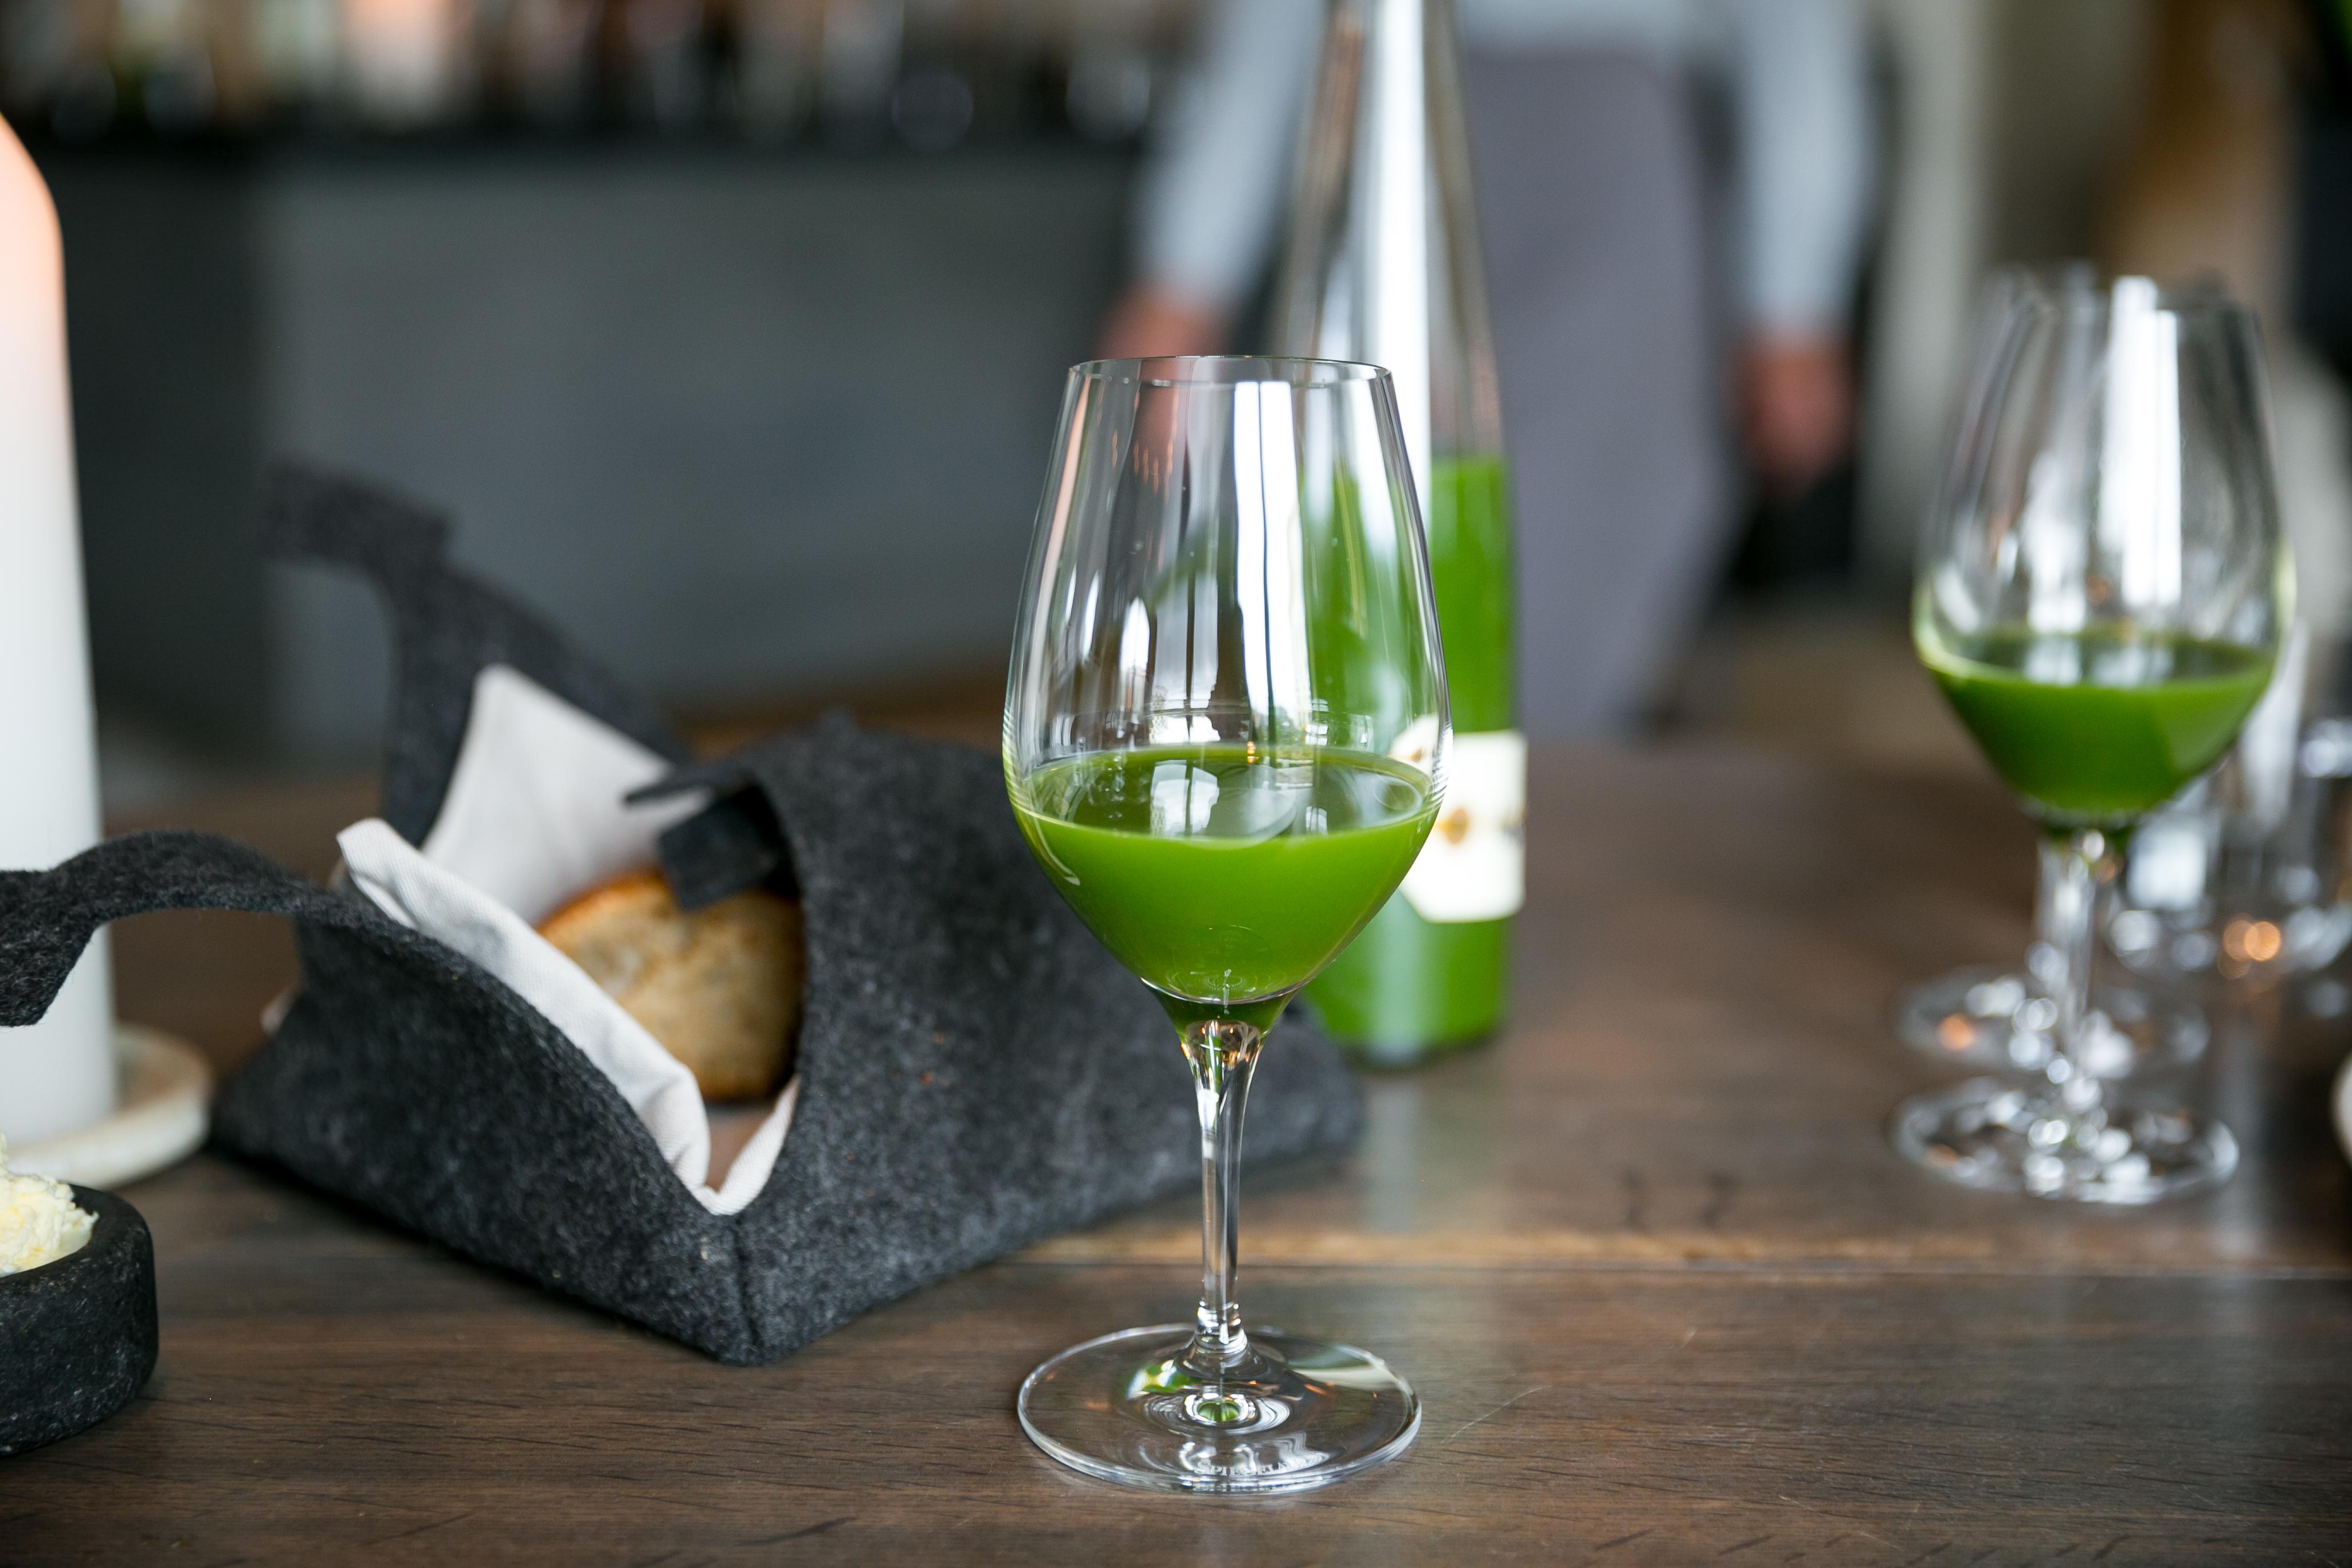 File:Juice Nasturtium, spinach, and sorrel for acidity ...